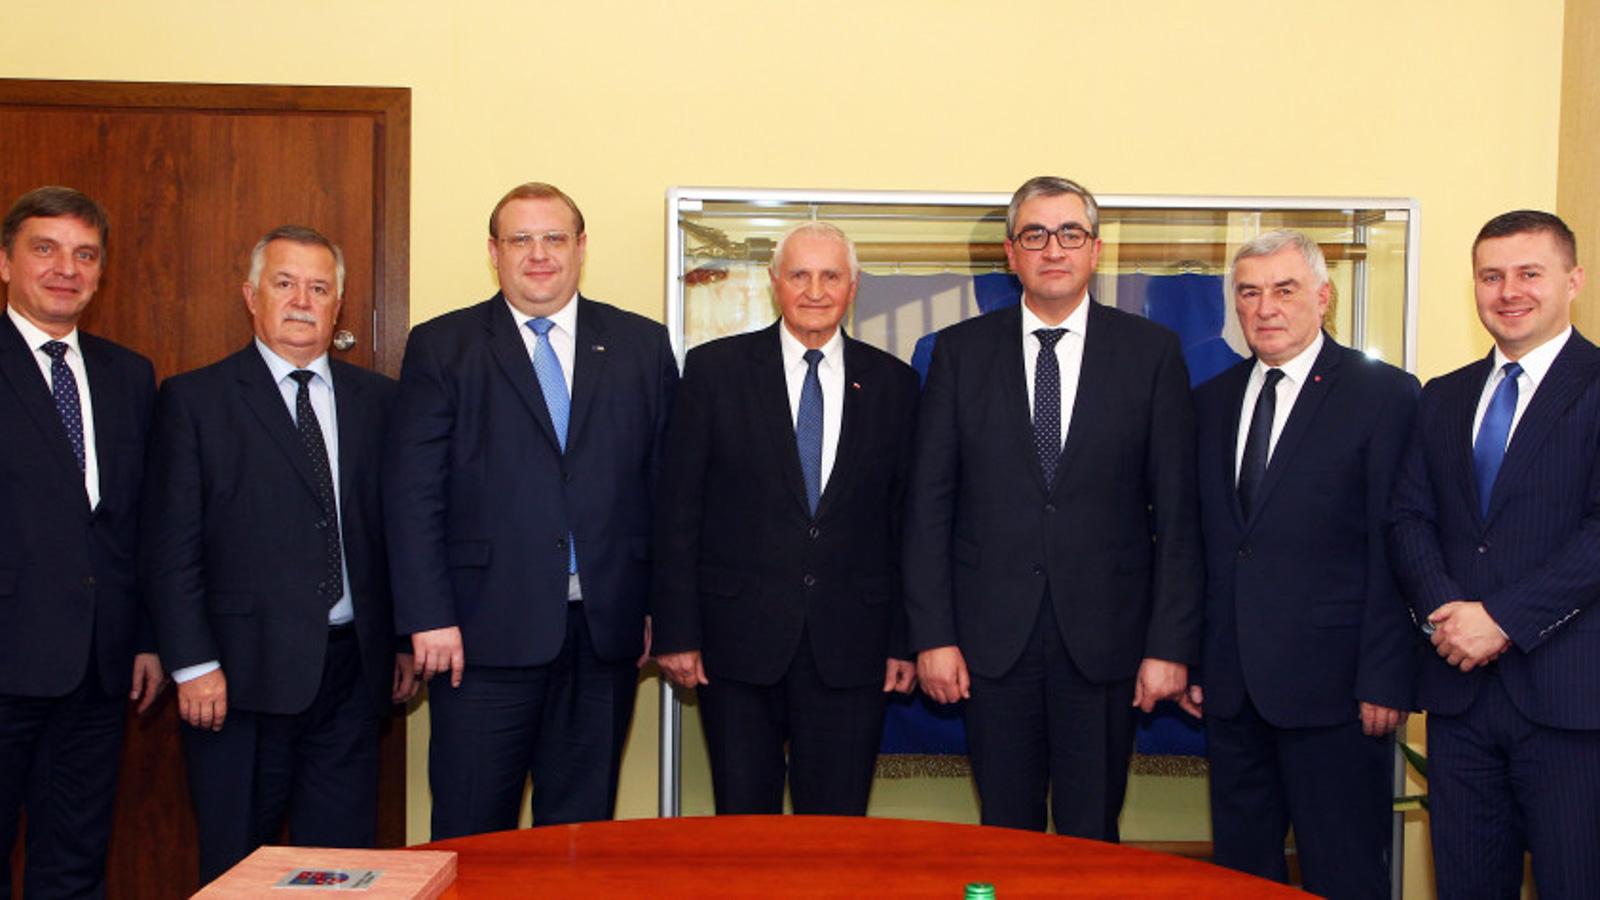 Wizyta-delegacji-z-Ukrainy-10-1024x474